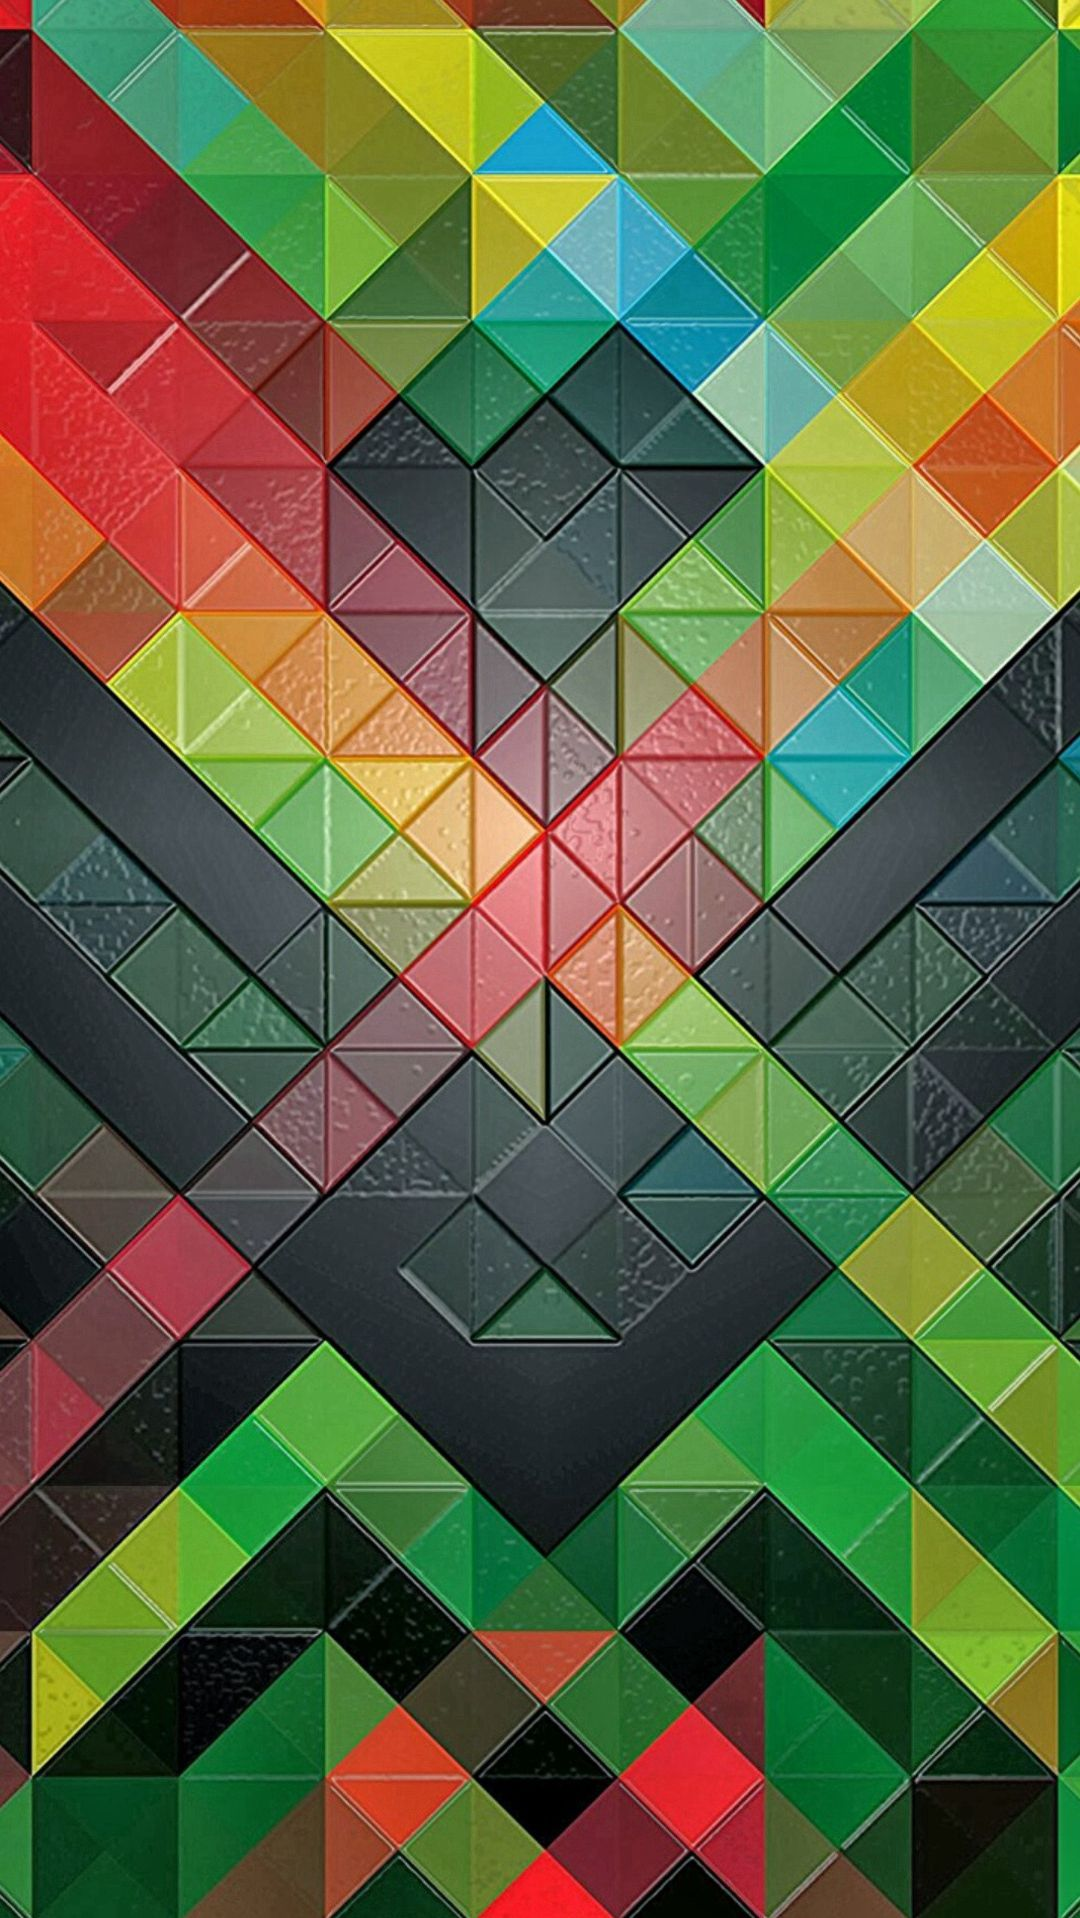 Most Inspiring Wallpaper Cell Phone Colorful - 425aa588dd228ba2ef979720f03af30f  Snapshot_553675 .jpg